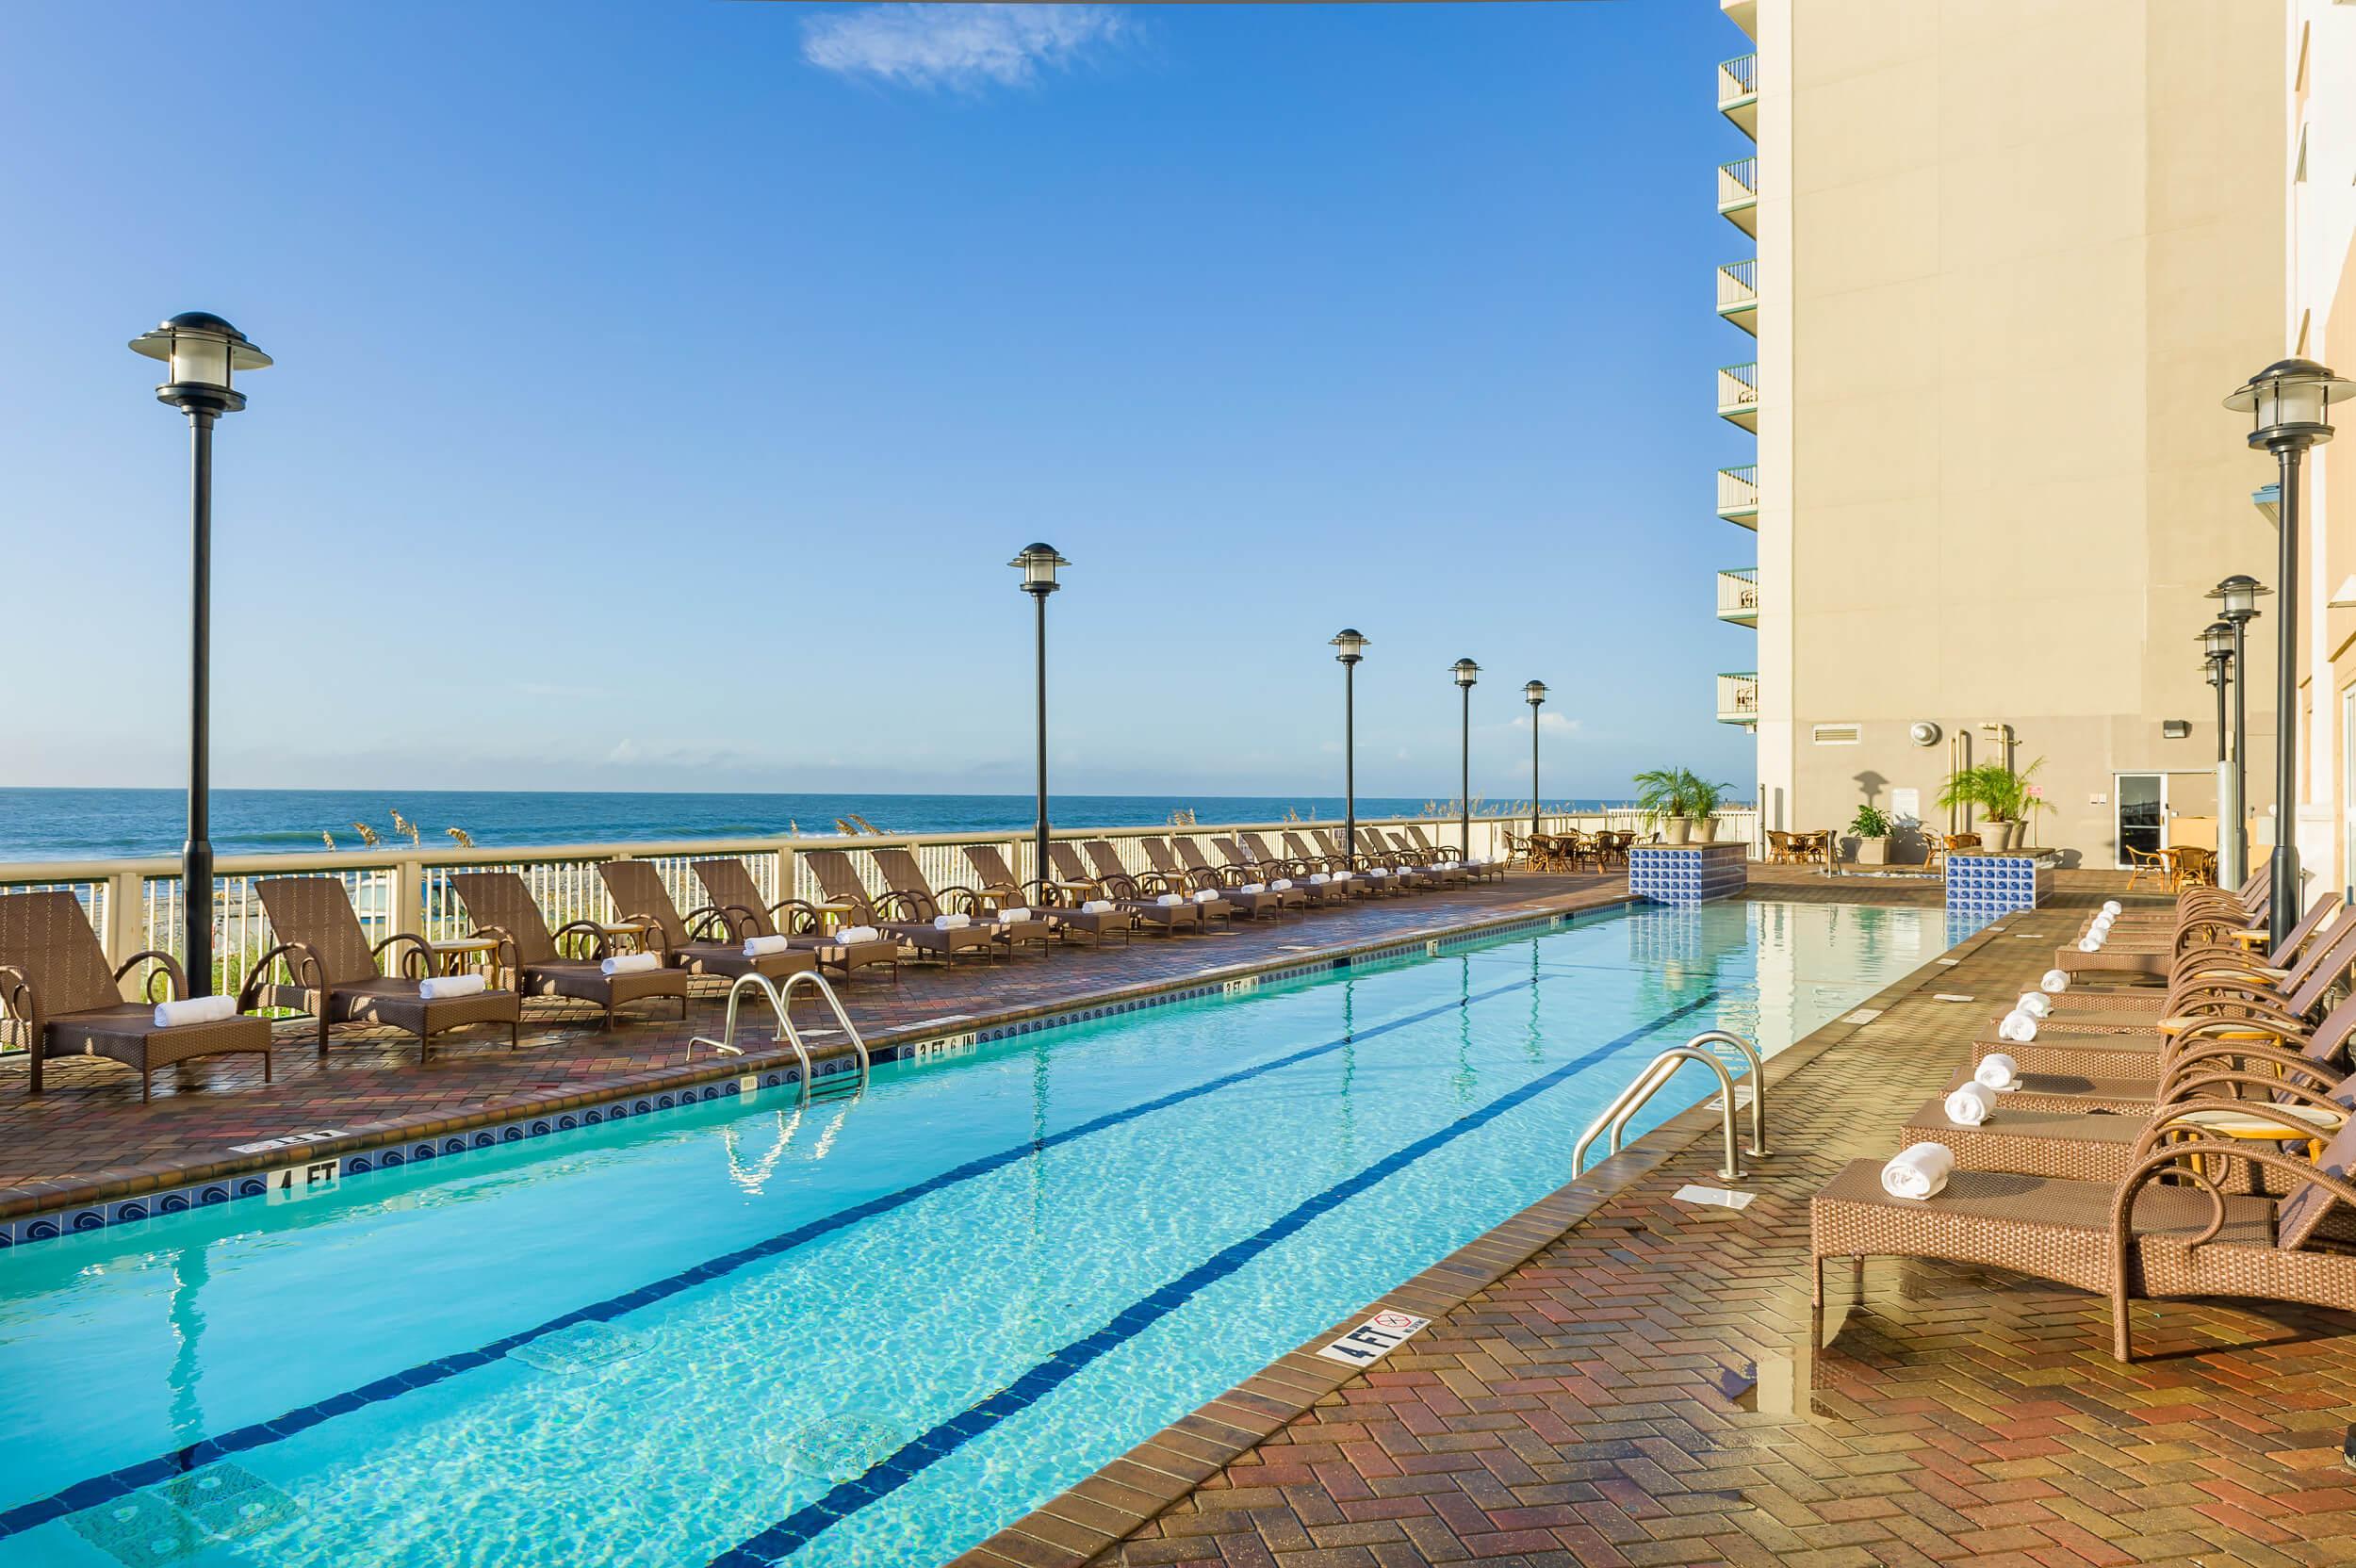 Discount Hotel Room Rates at a Myrtle Beach SC Resort Hotel | Westgate Myrtle Beach Oceanfront Resort